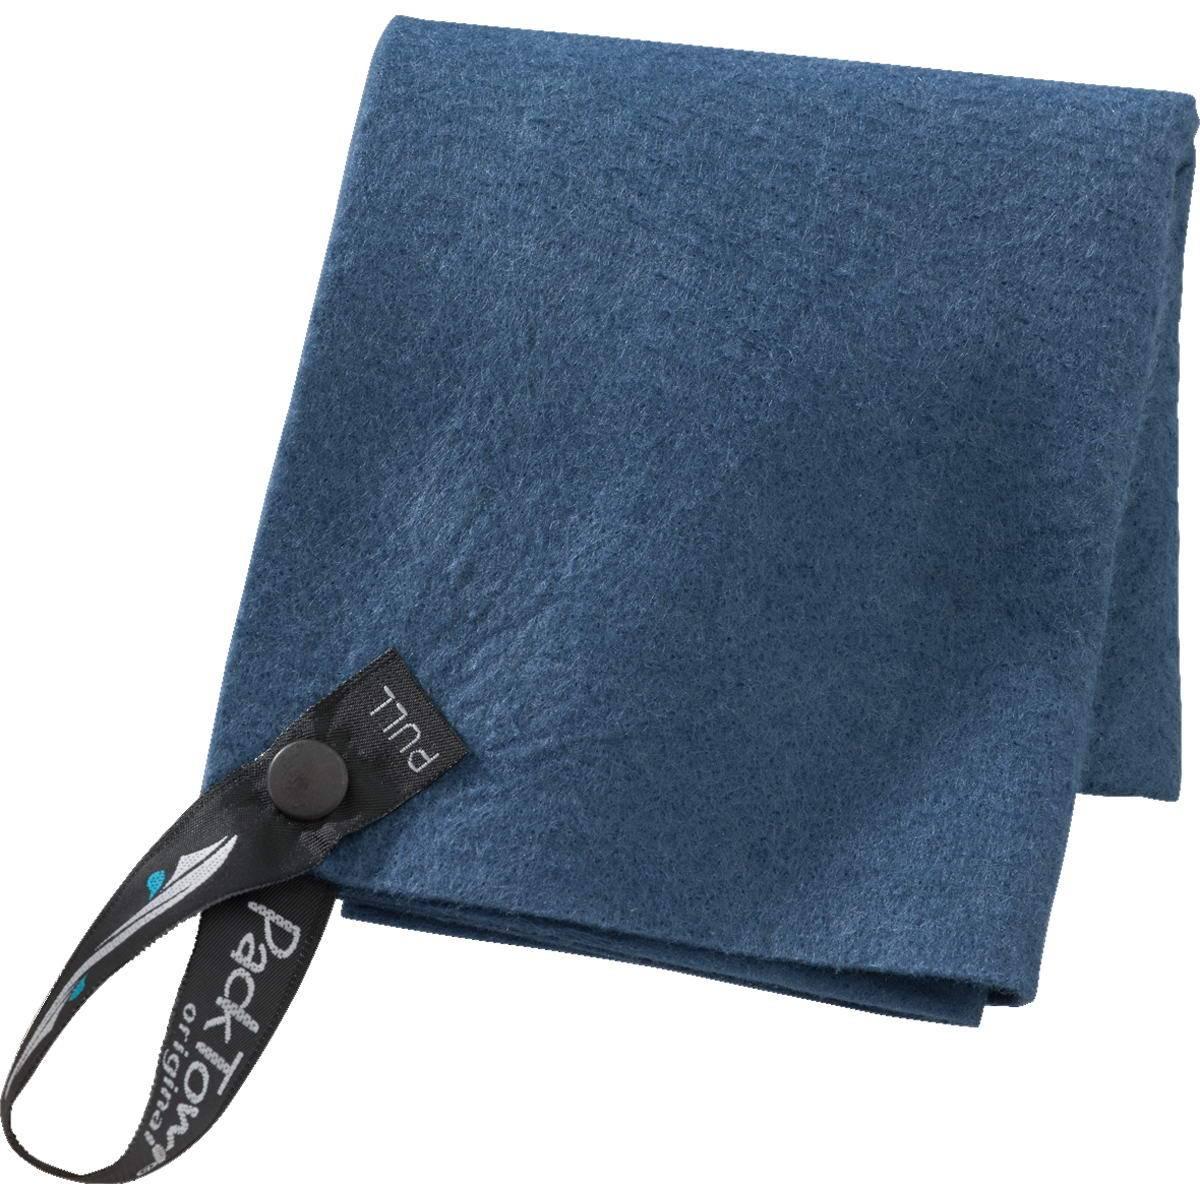 PackTowl Original S - Handtuch blue - Bild 1